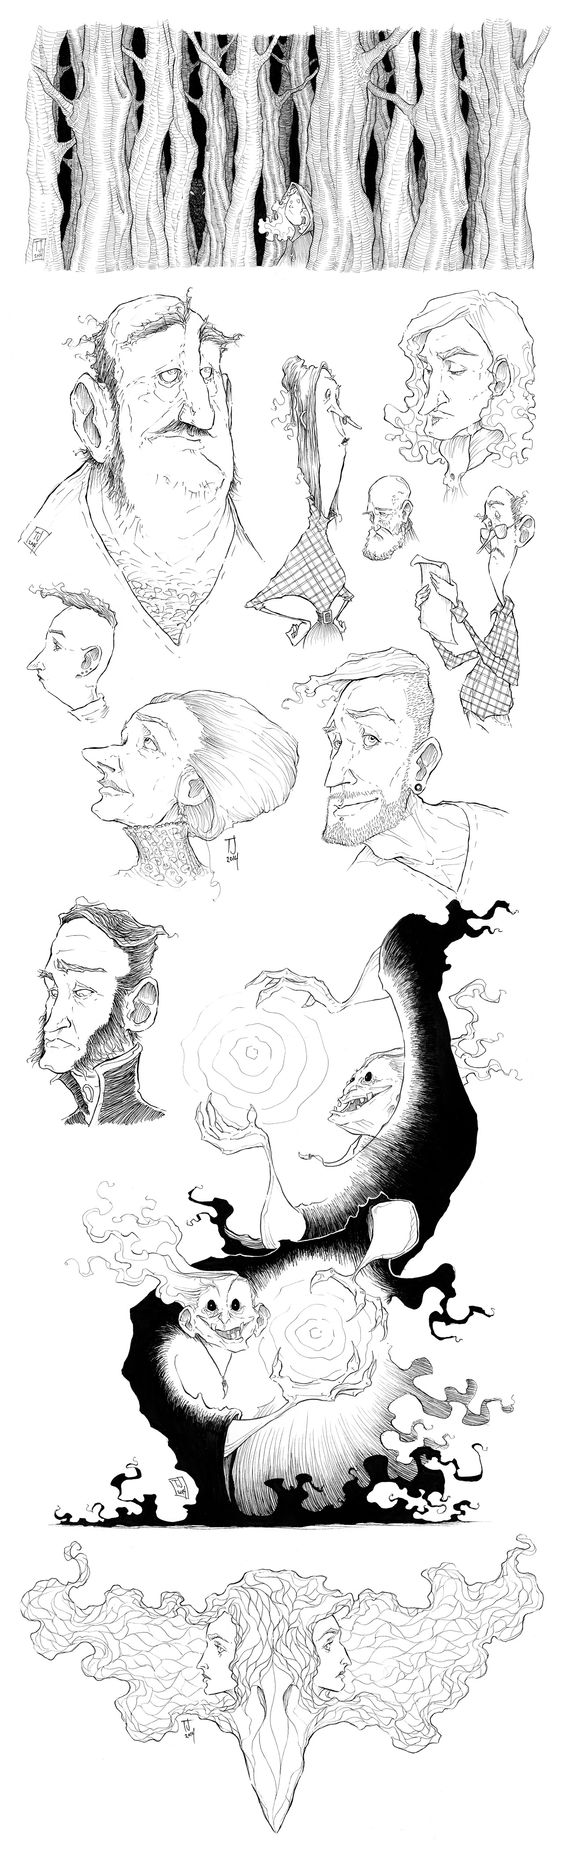 ART DUMP 1 | 2014 by Ripplen.deviantart.com on @deviantART